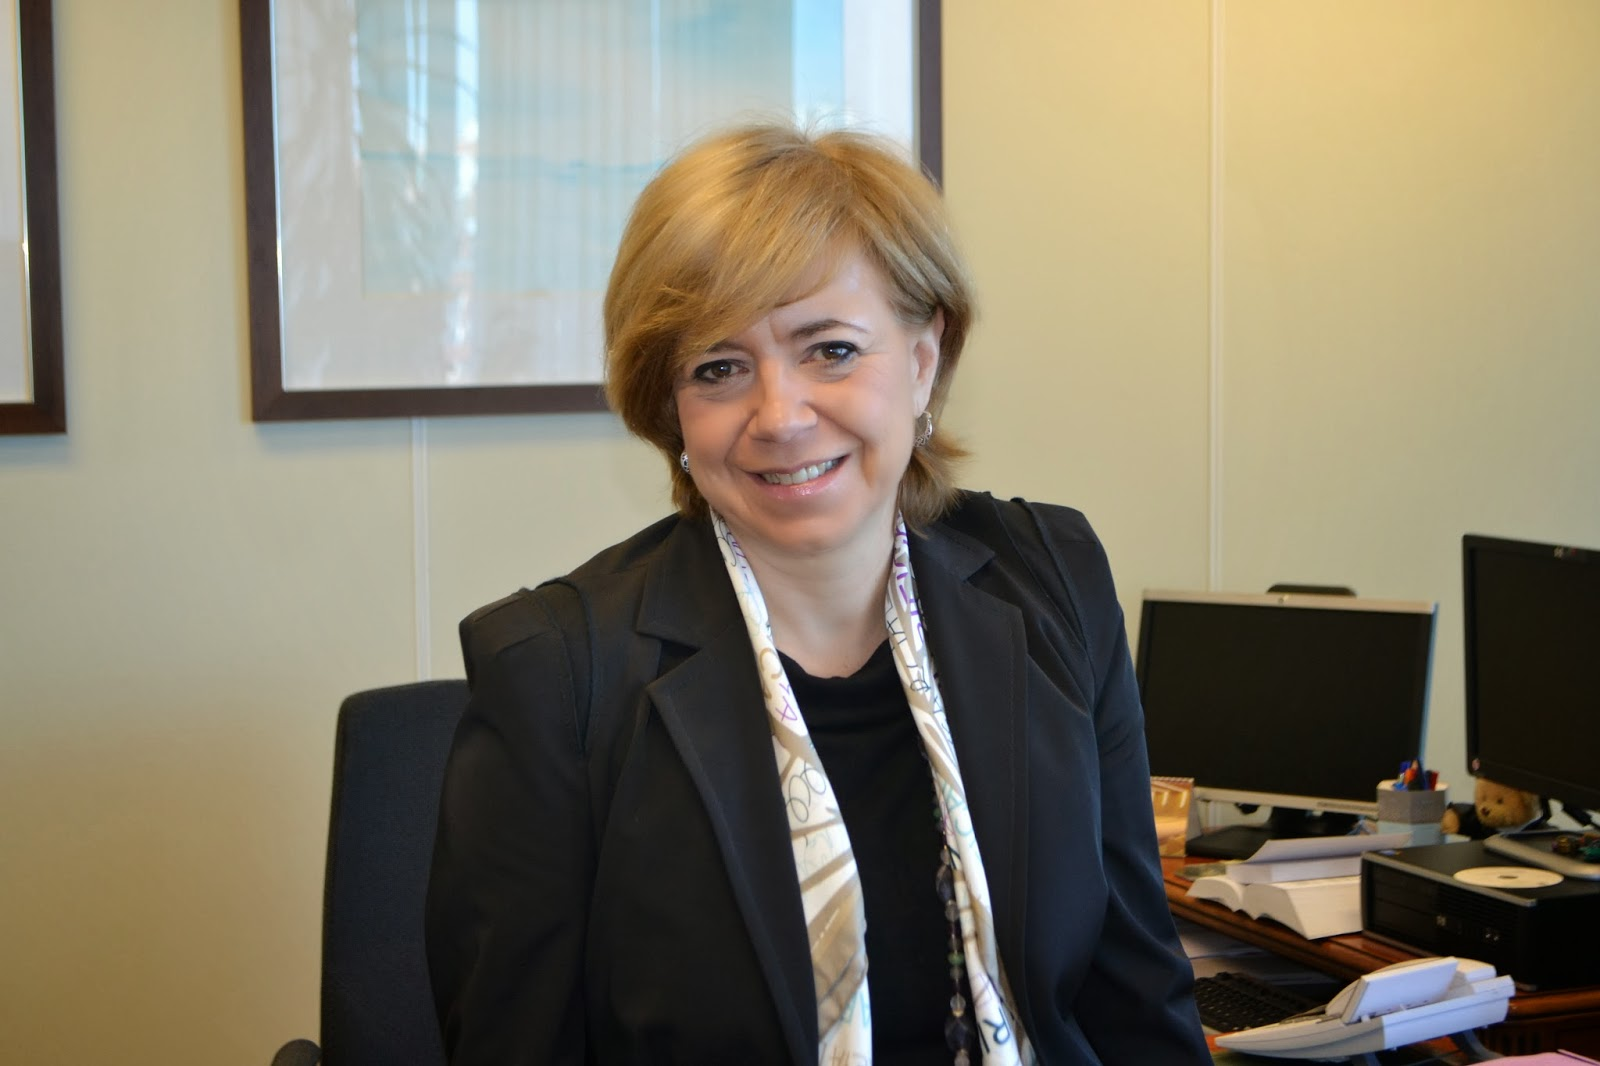 Maria Ferrer Murdock